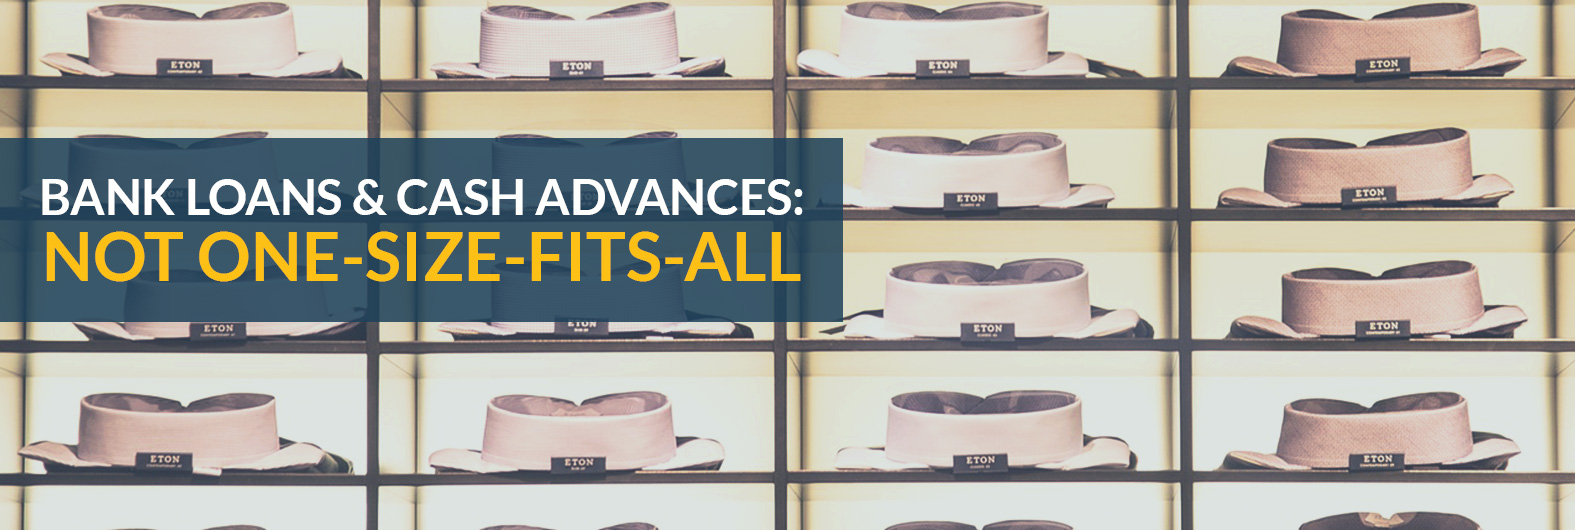 Bank Loans & Cash Advances: Not one-size-fits-all